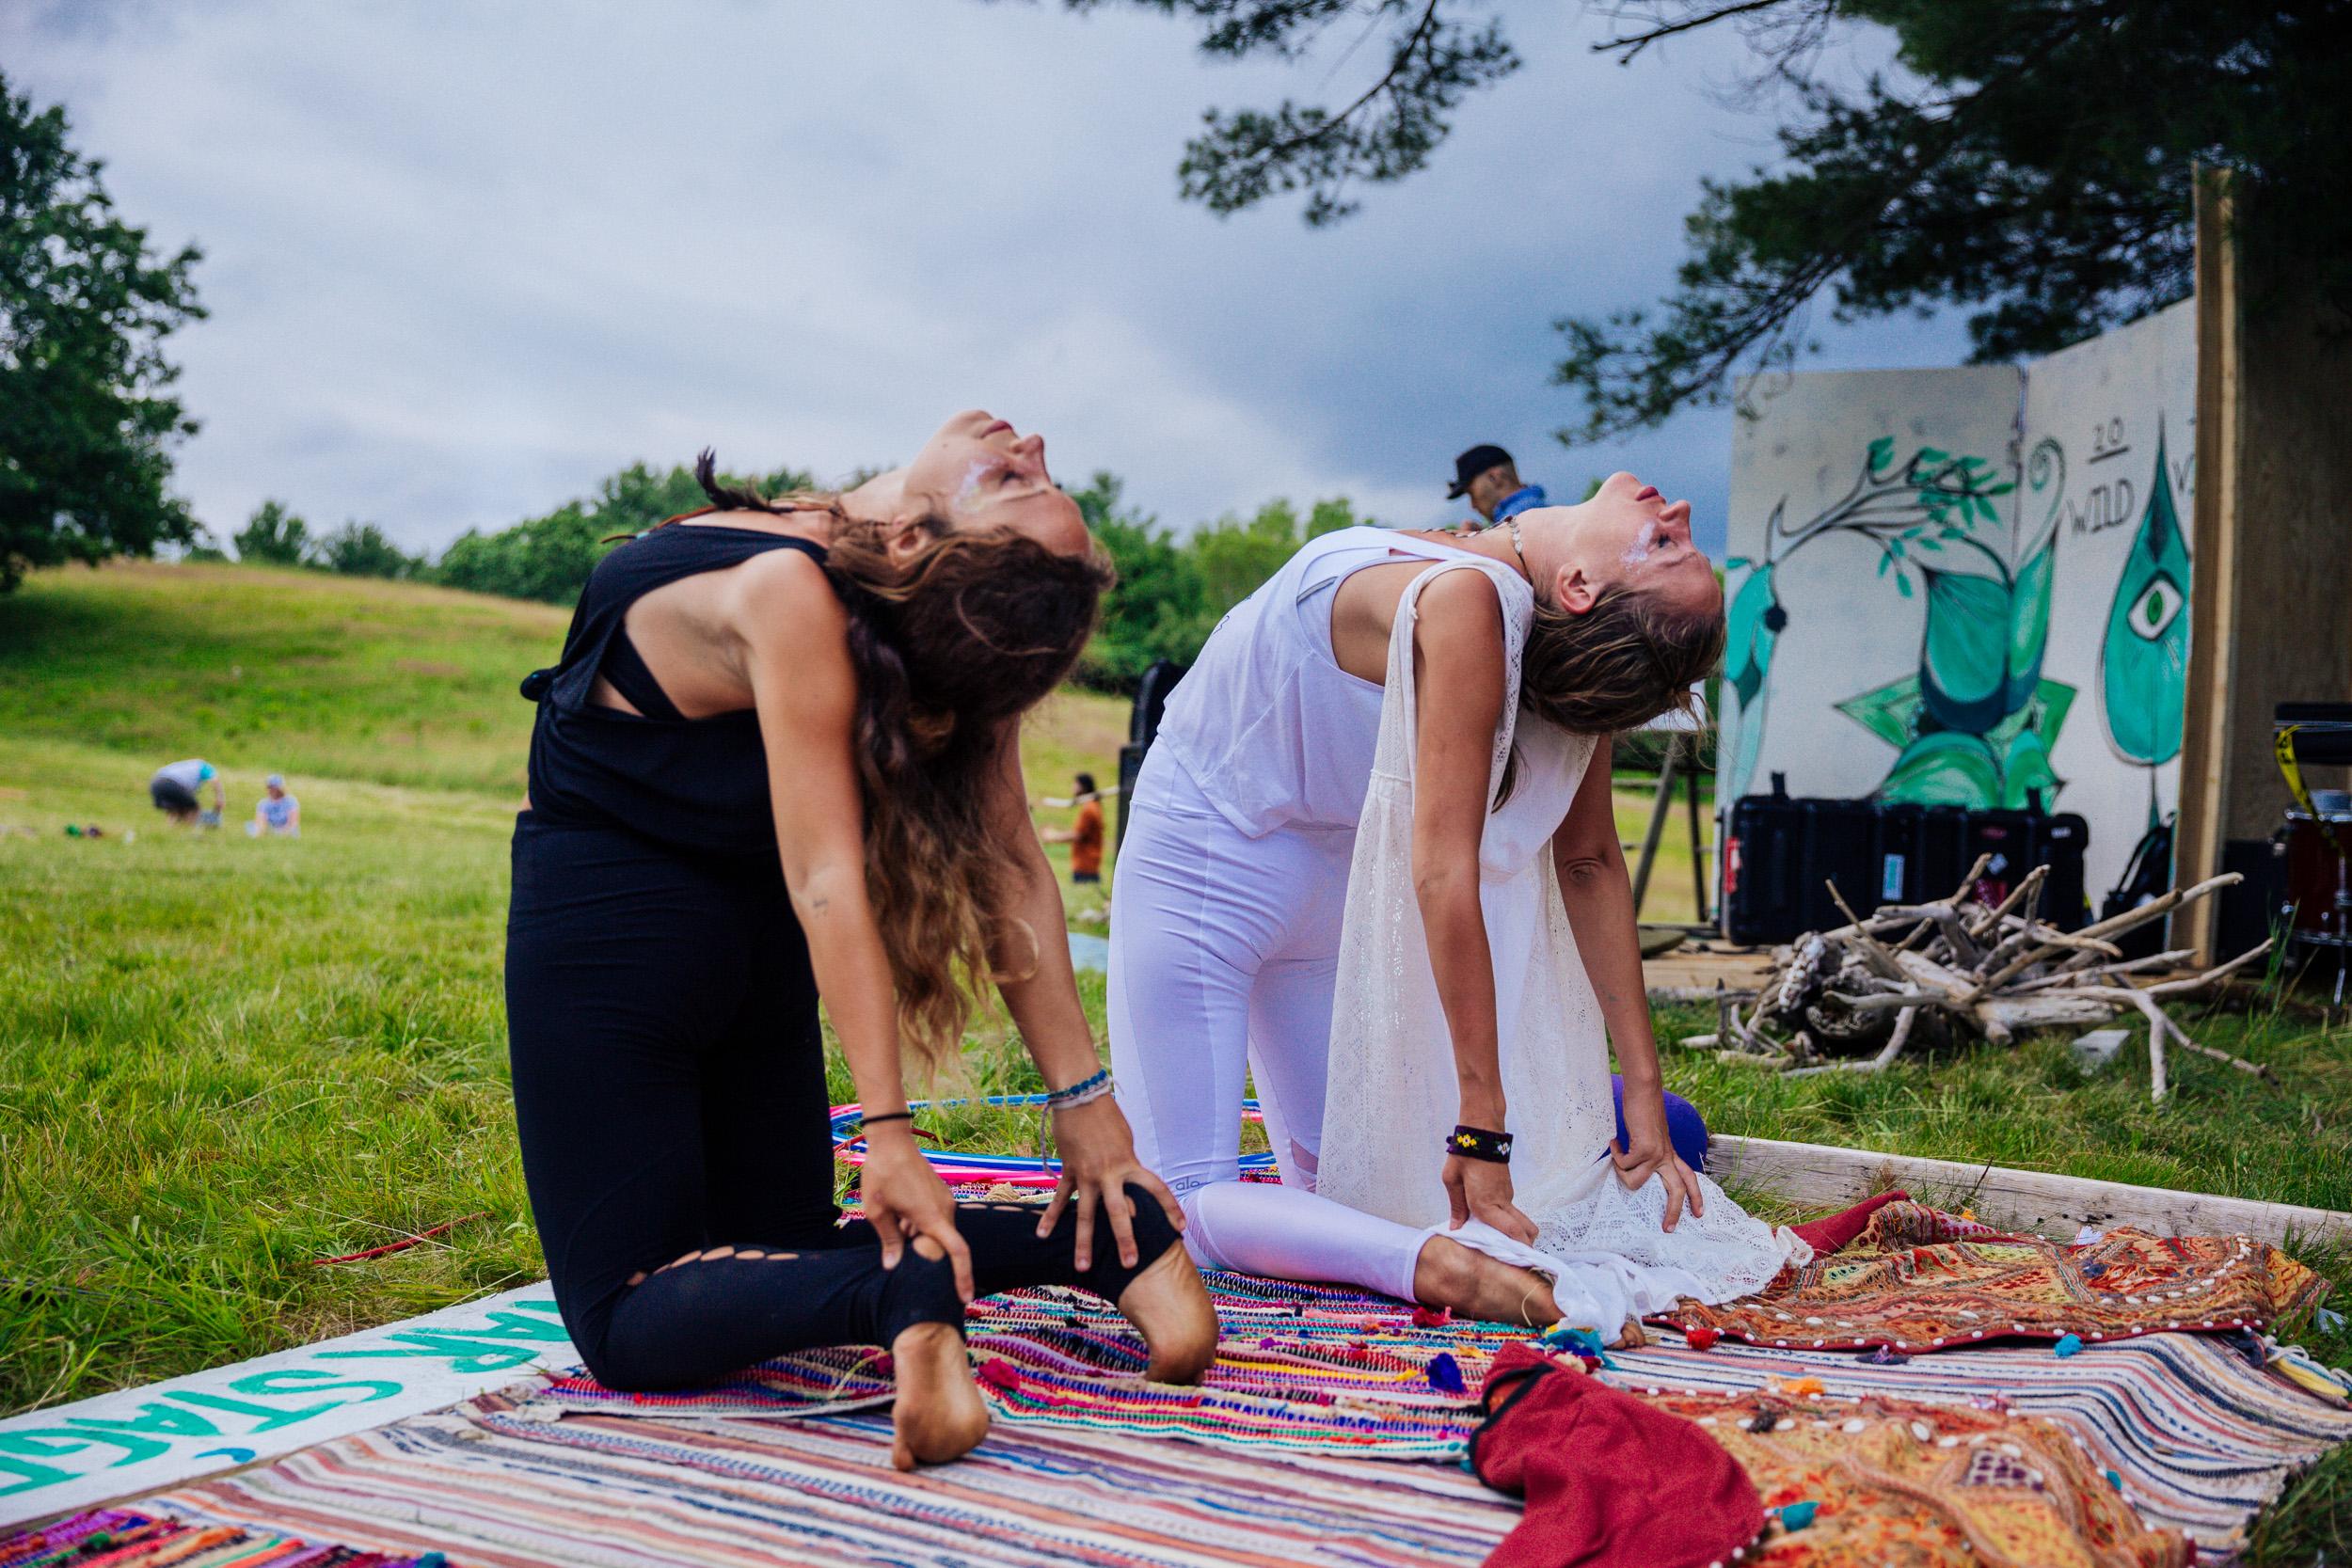 Monica.Justesen.Photography.07.17.Maine.Yoga.Festival.Lifestyle.293.jpg